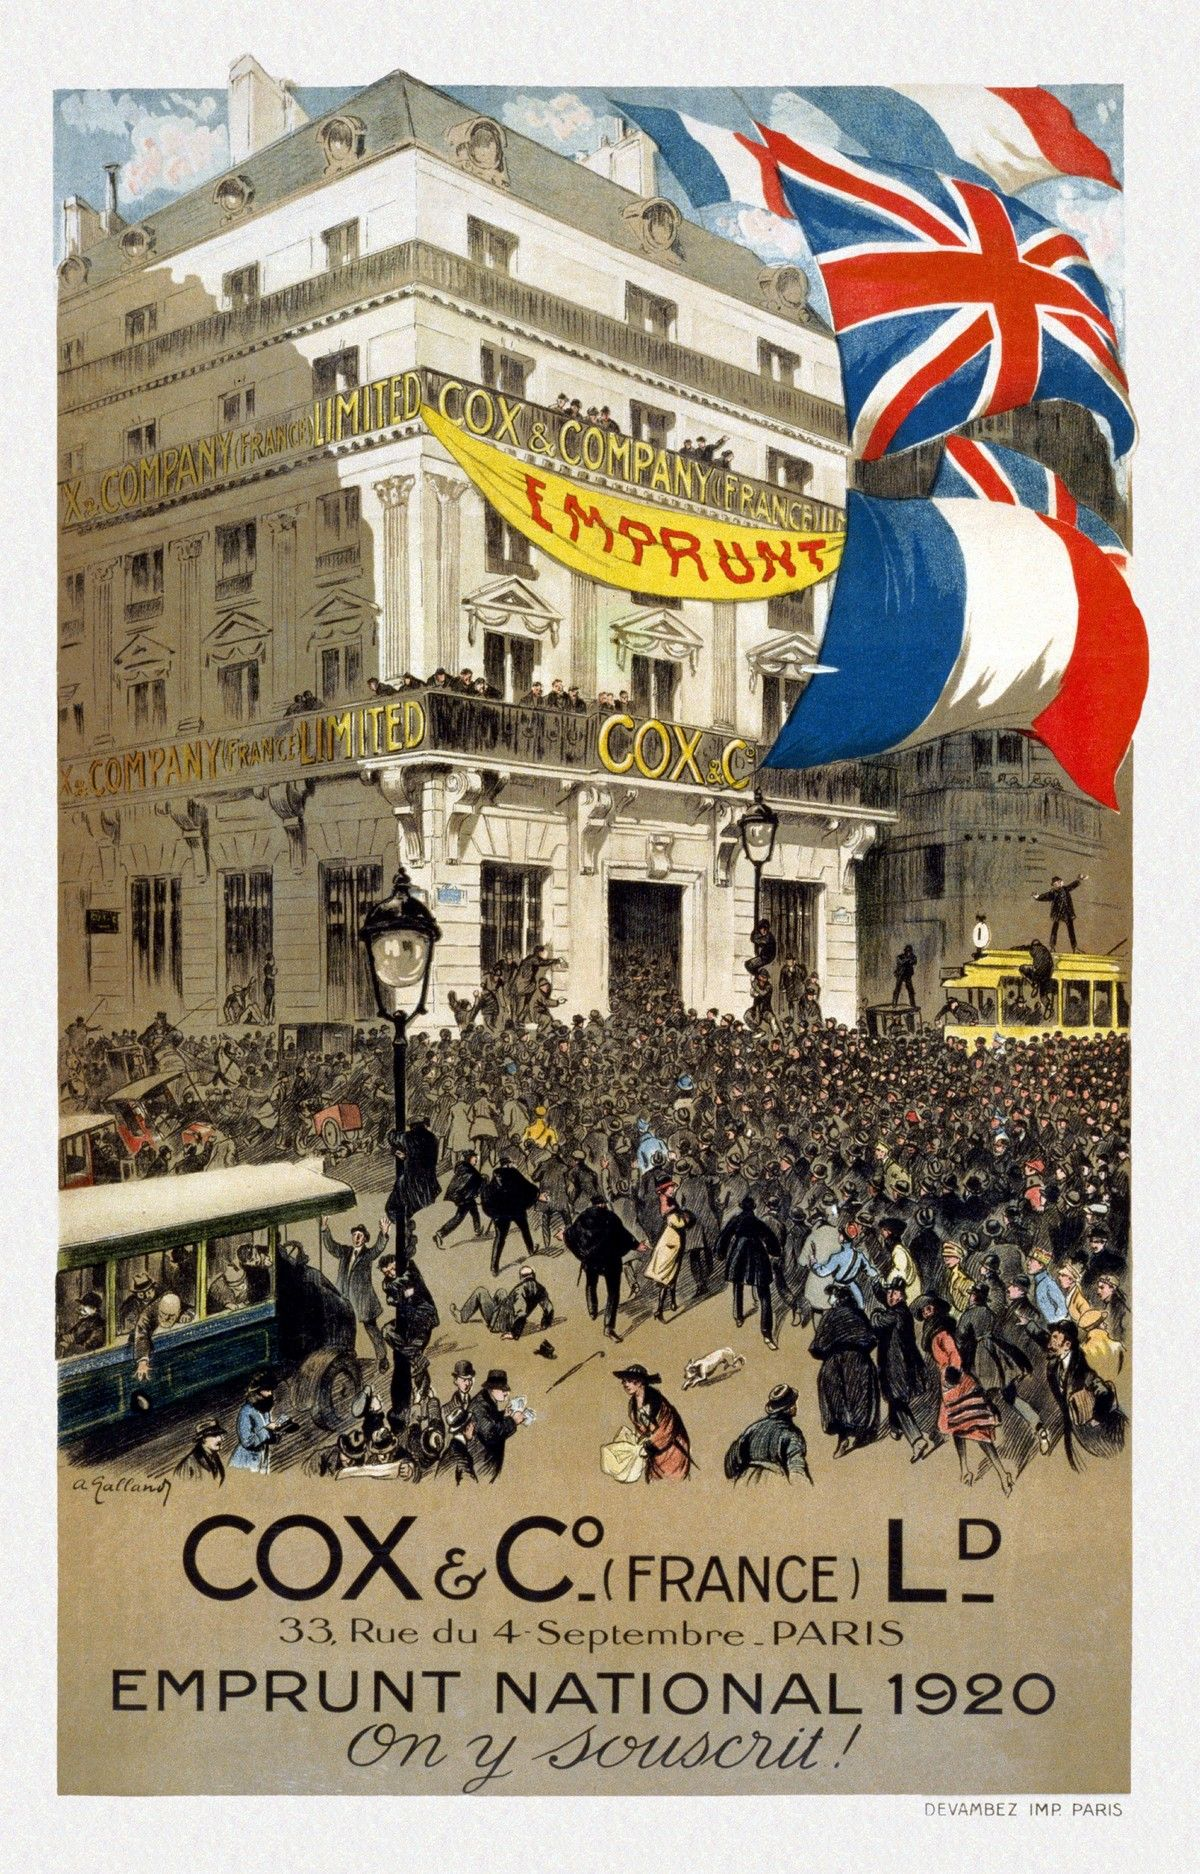 1920 EMPRUNT NATIONAL french propaganda poster 24x36 COLLECTORS unique